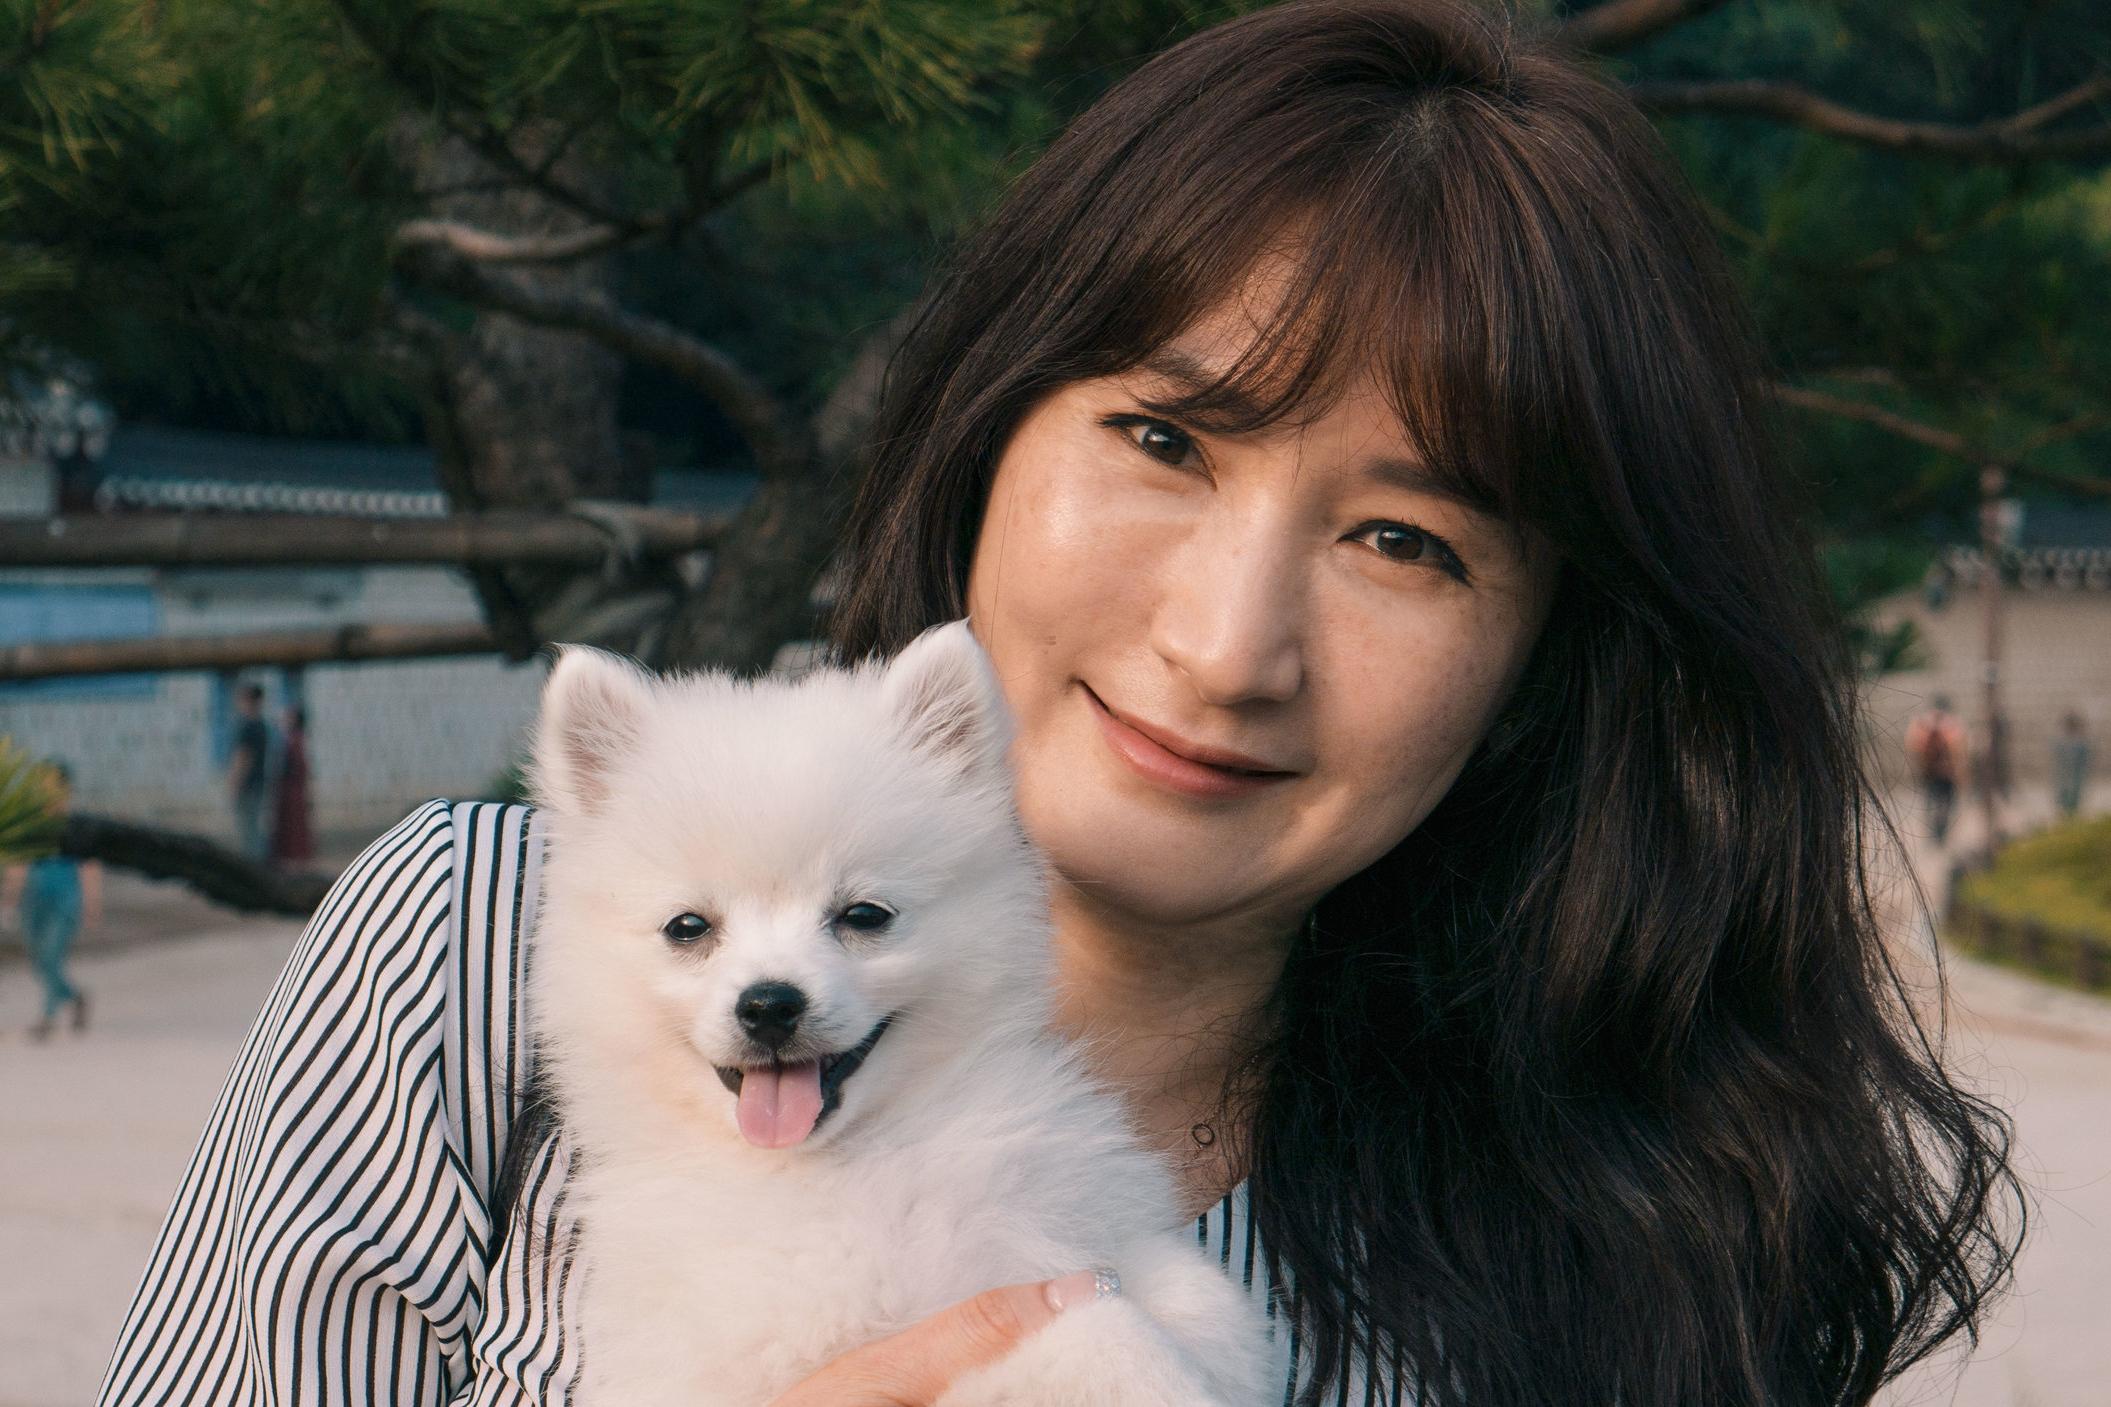 Eunsun Kim